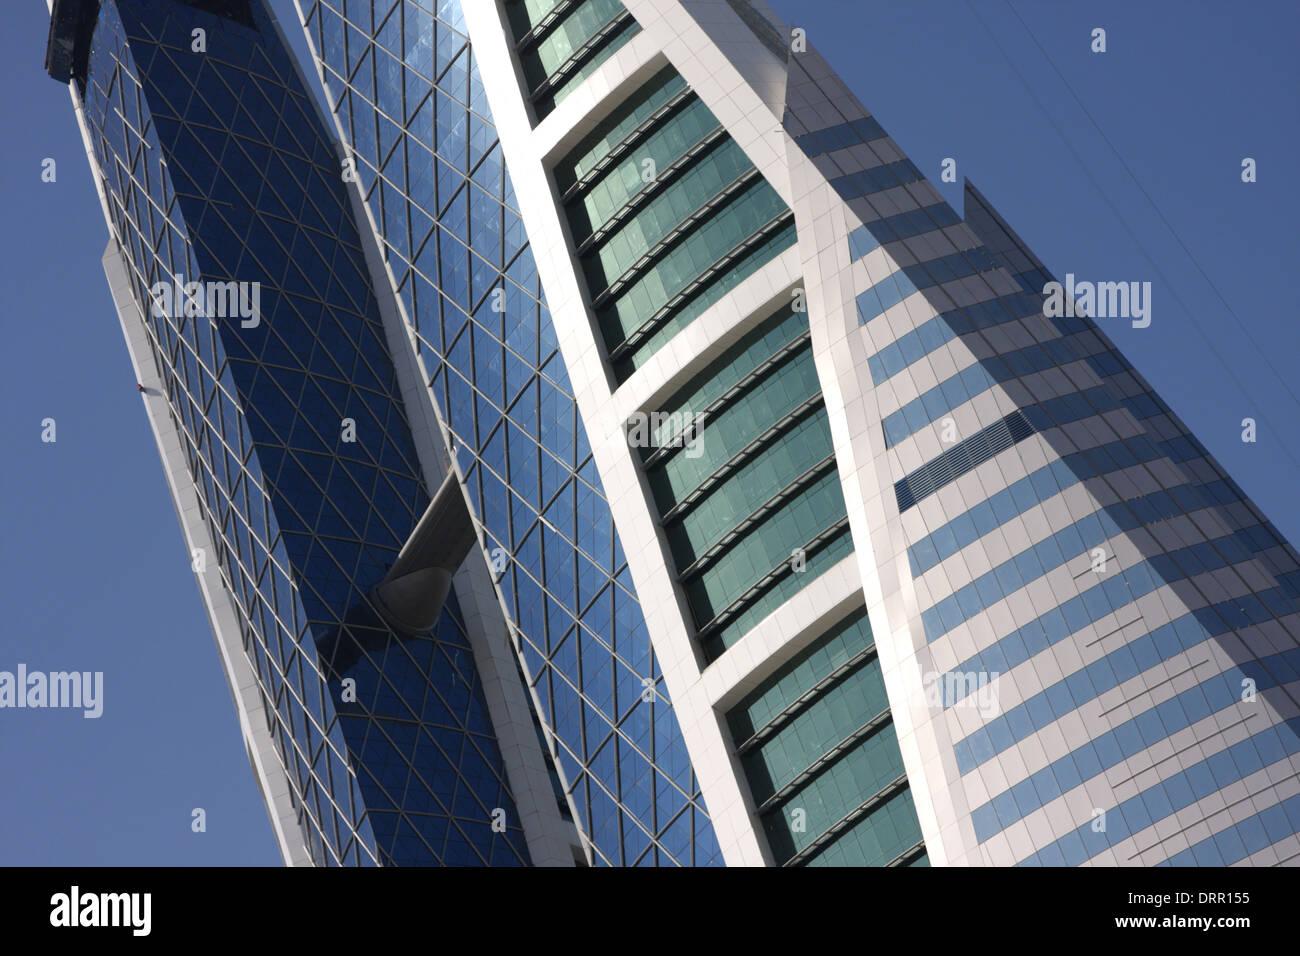 World Trade Centre Building, Manama, Kingdom of Bahrain - Stock Image